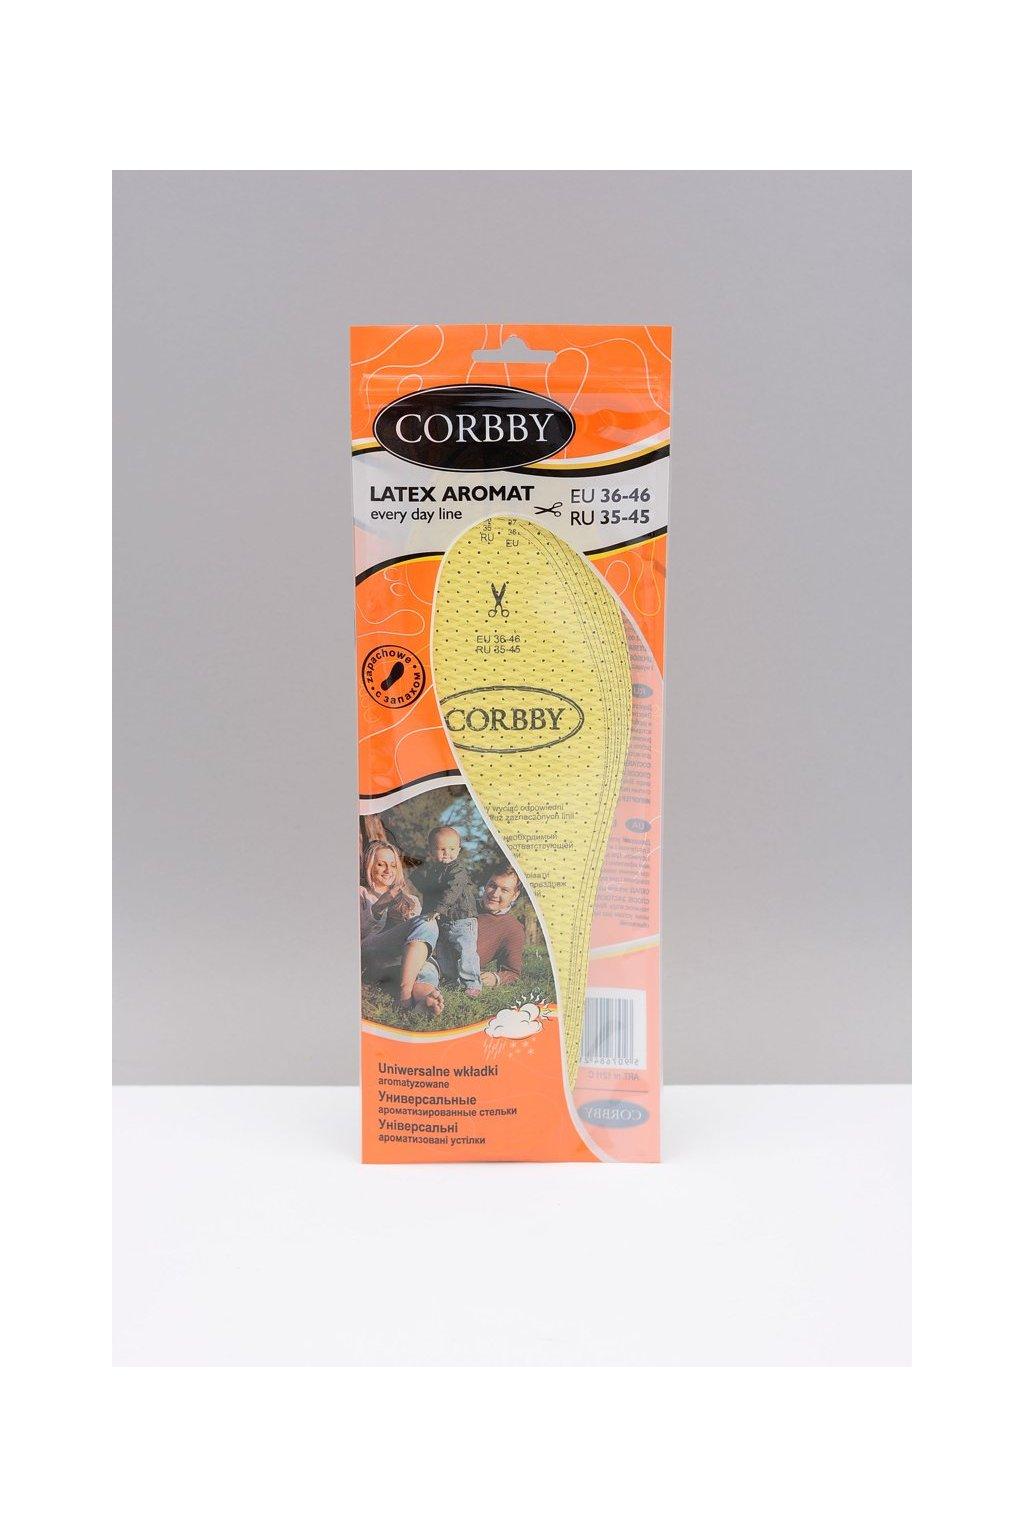 Vložky do topánok stielky kód 1211 CORBBY LATEX AROMAT